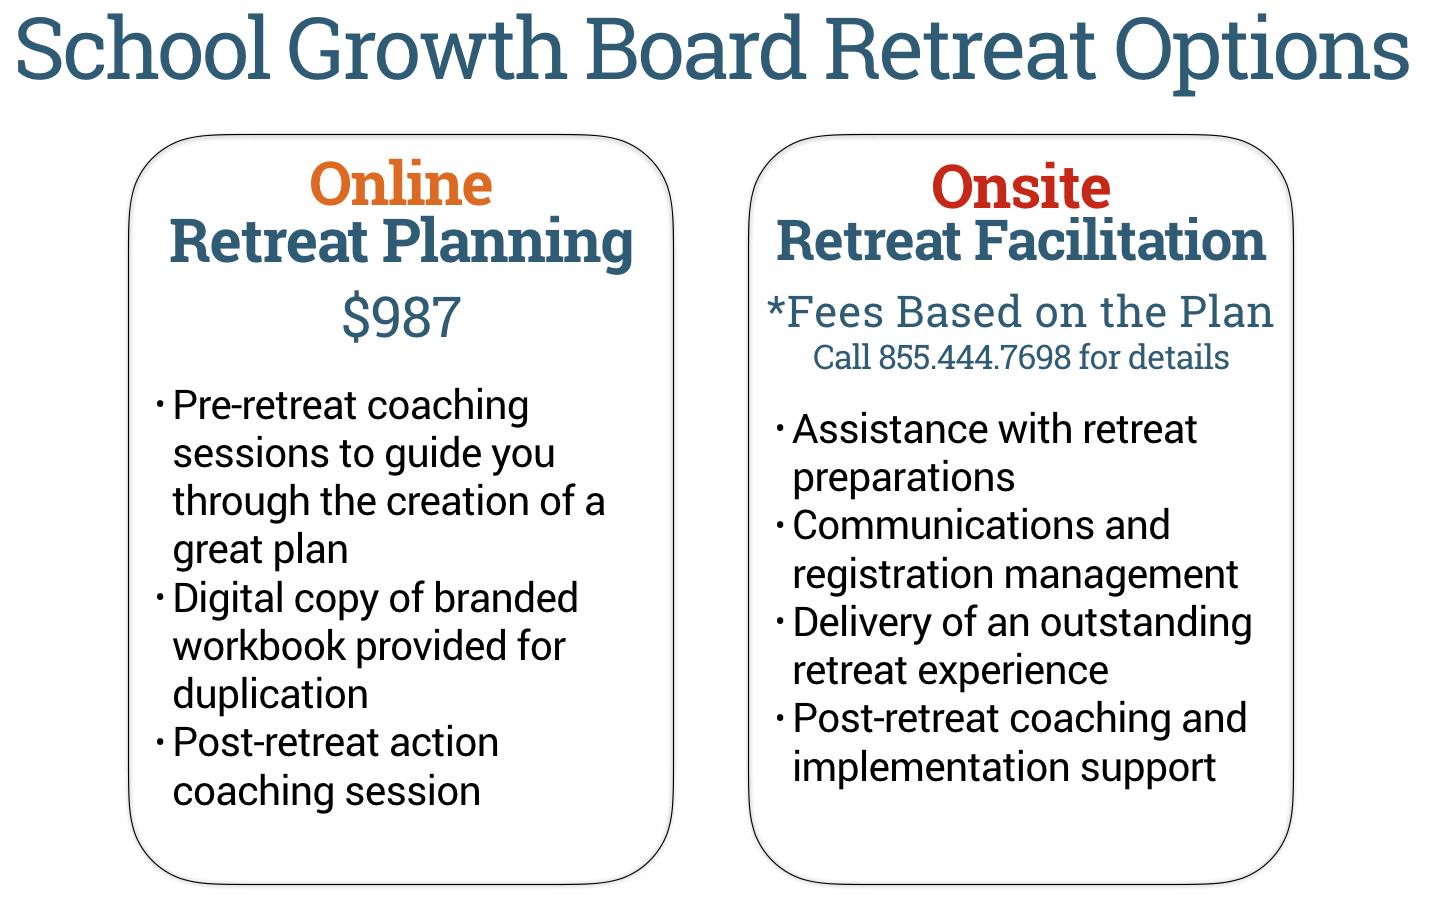 SG Board Retreat Options.png